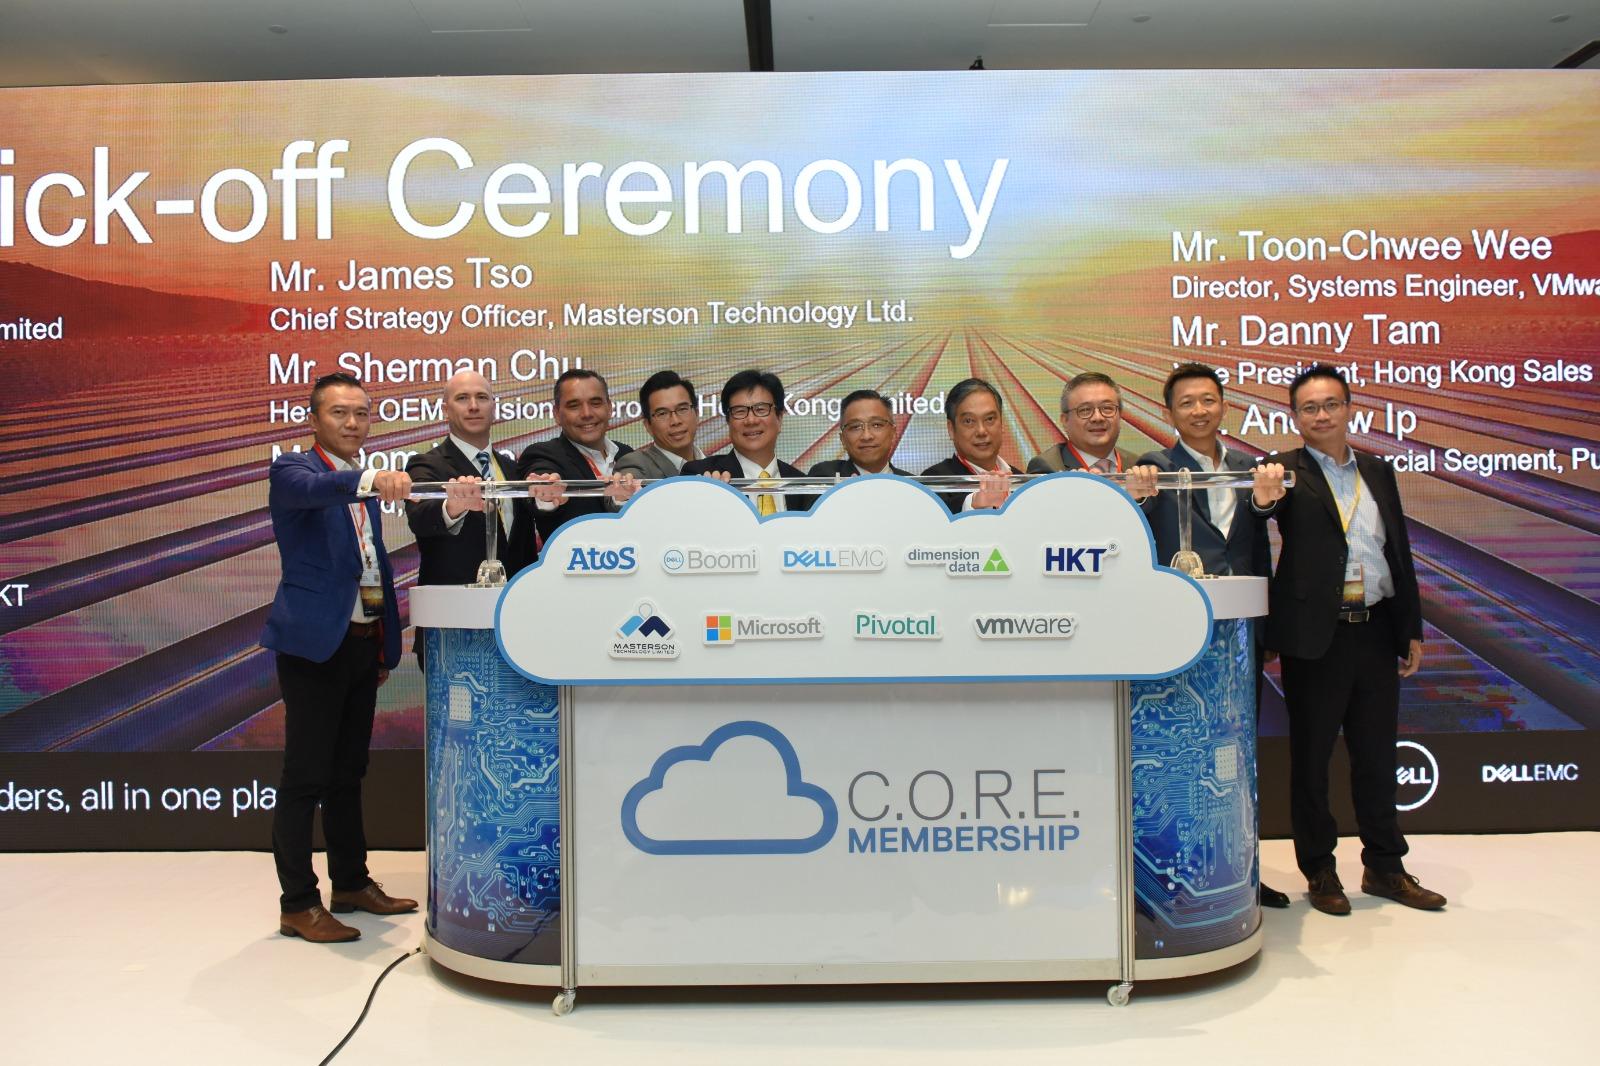 Dell EMC公佈全新端到端多雲生態系統「雲端開放資源生態系統」(Cloud Open Resources Ecosystem) (C.O.R.E.) ,冀與一眾合作夥伴推動本地各大小企業在多雲技術的發展。